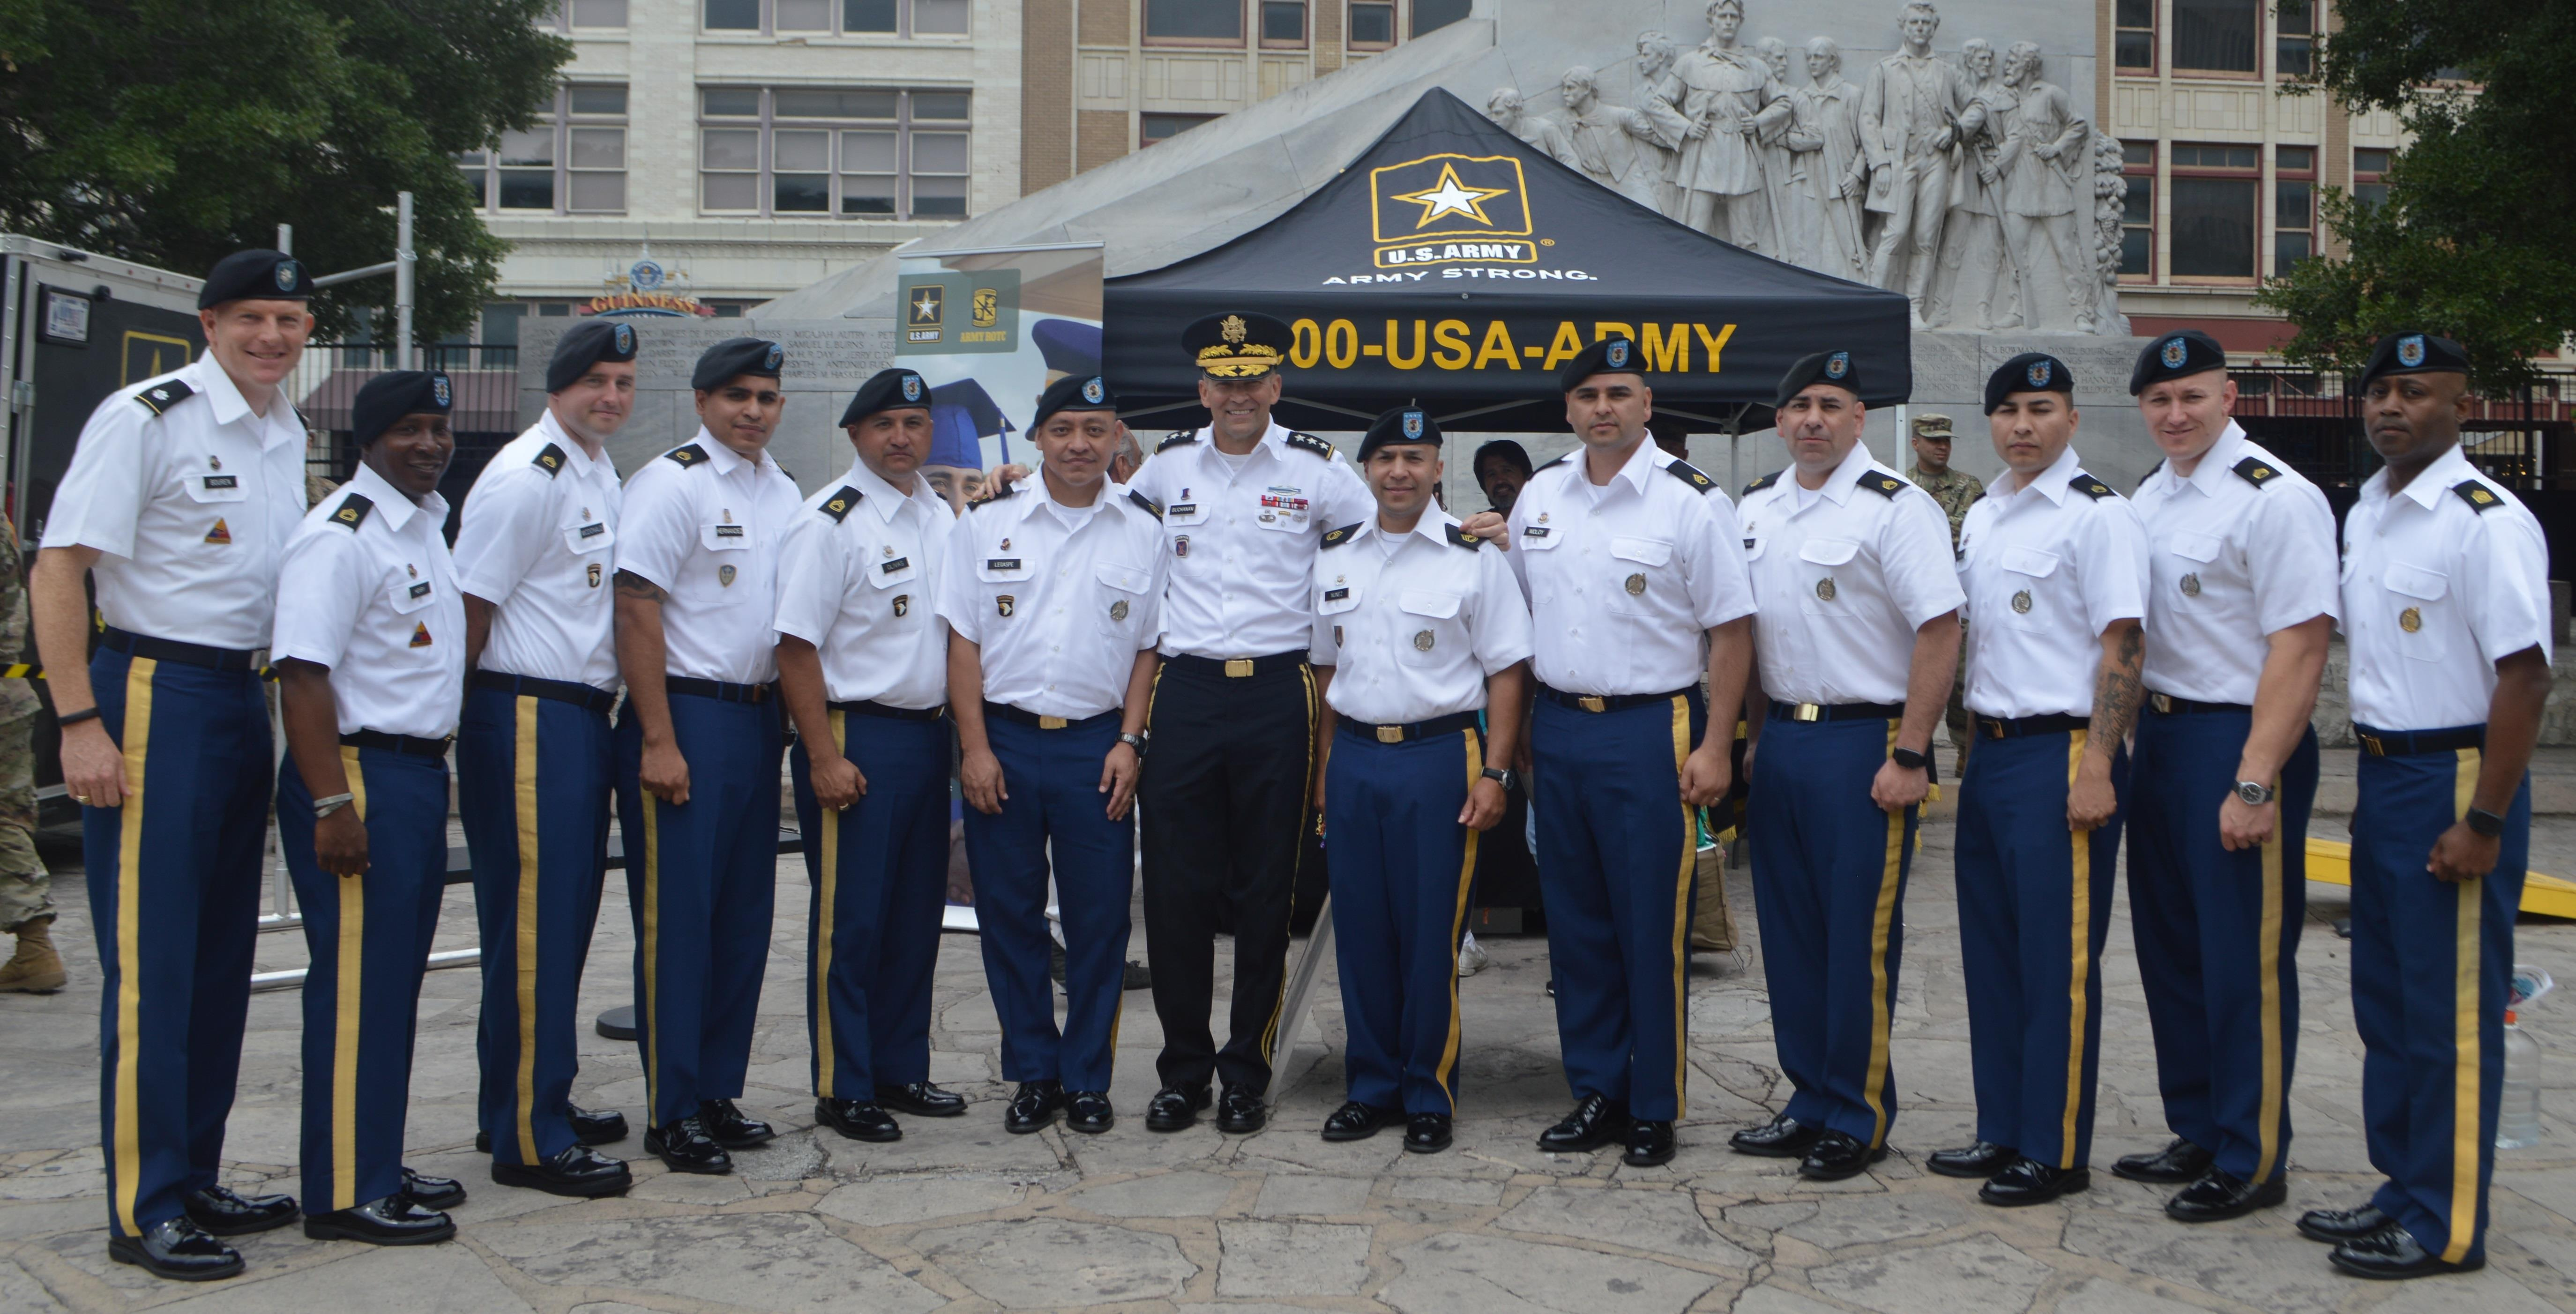 Top Army Recruiters Recognized During Fiesta San Antonio